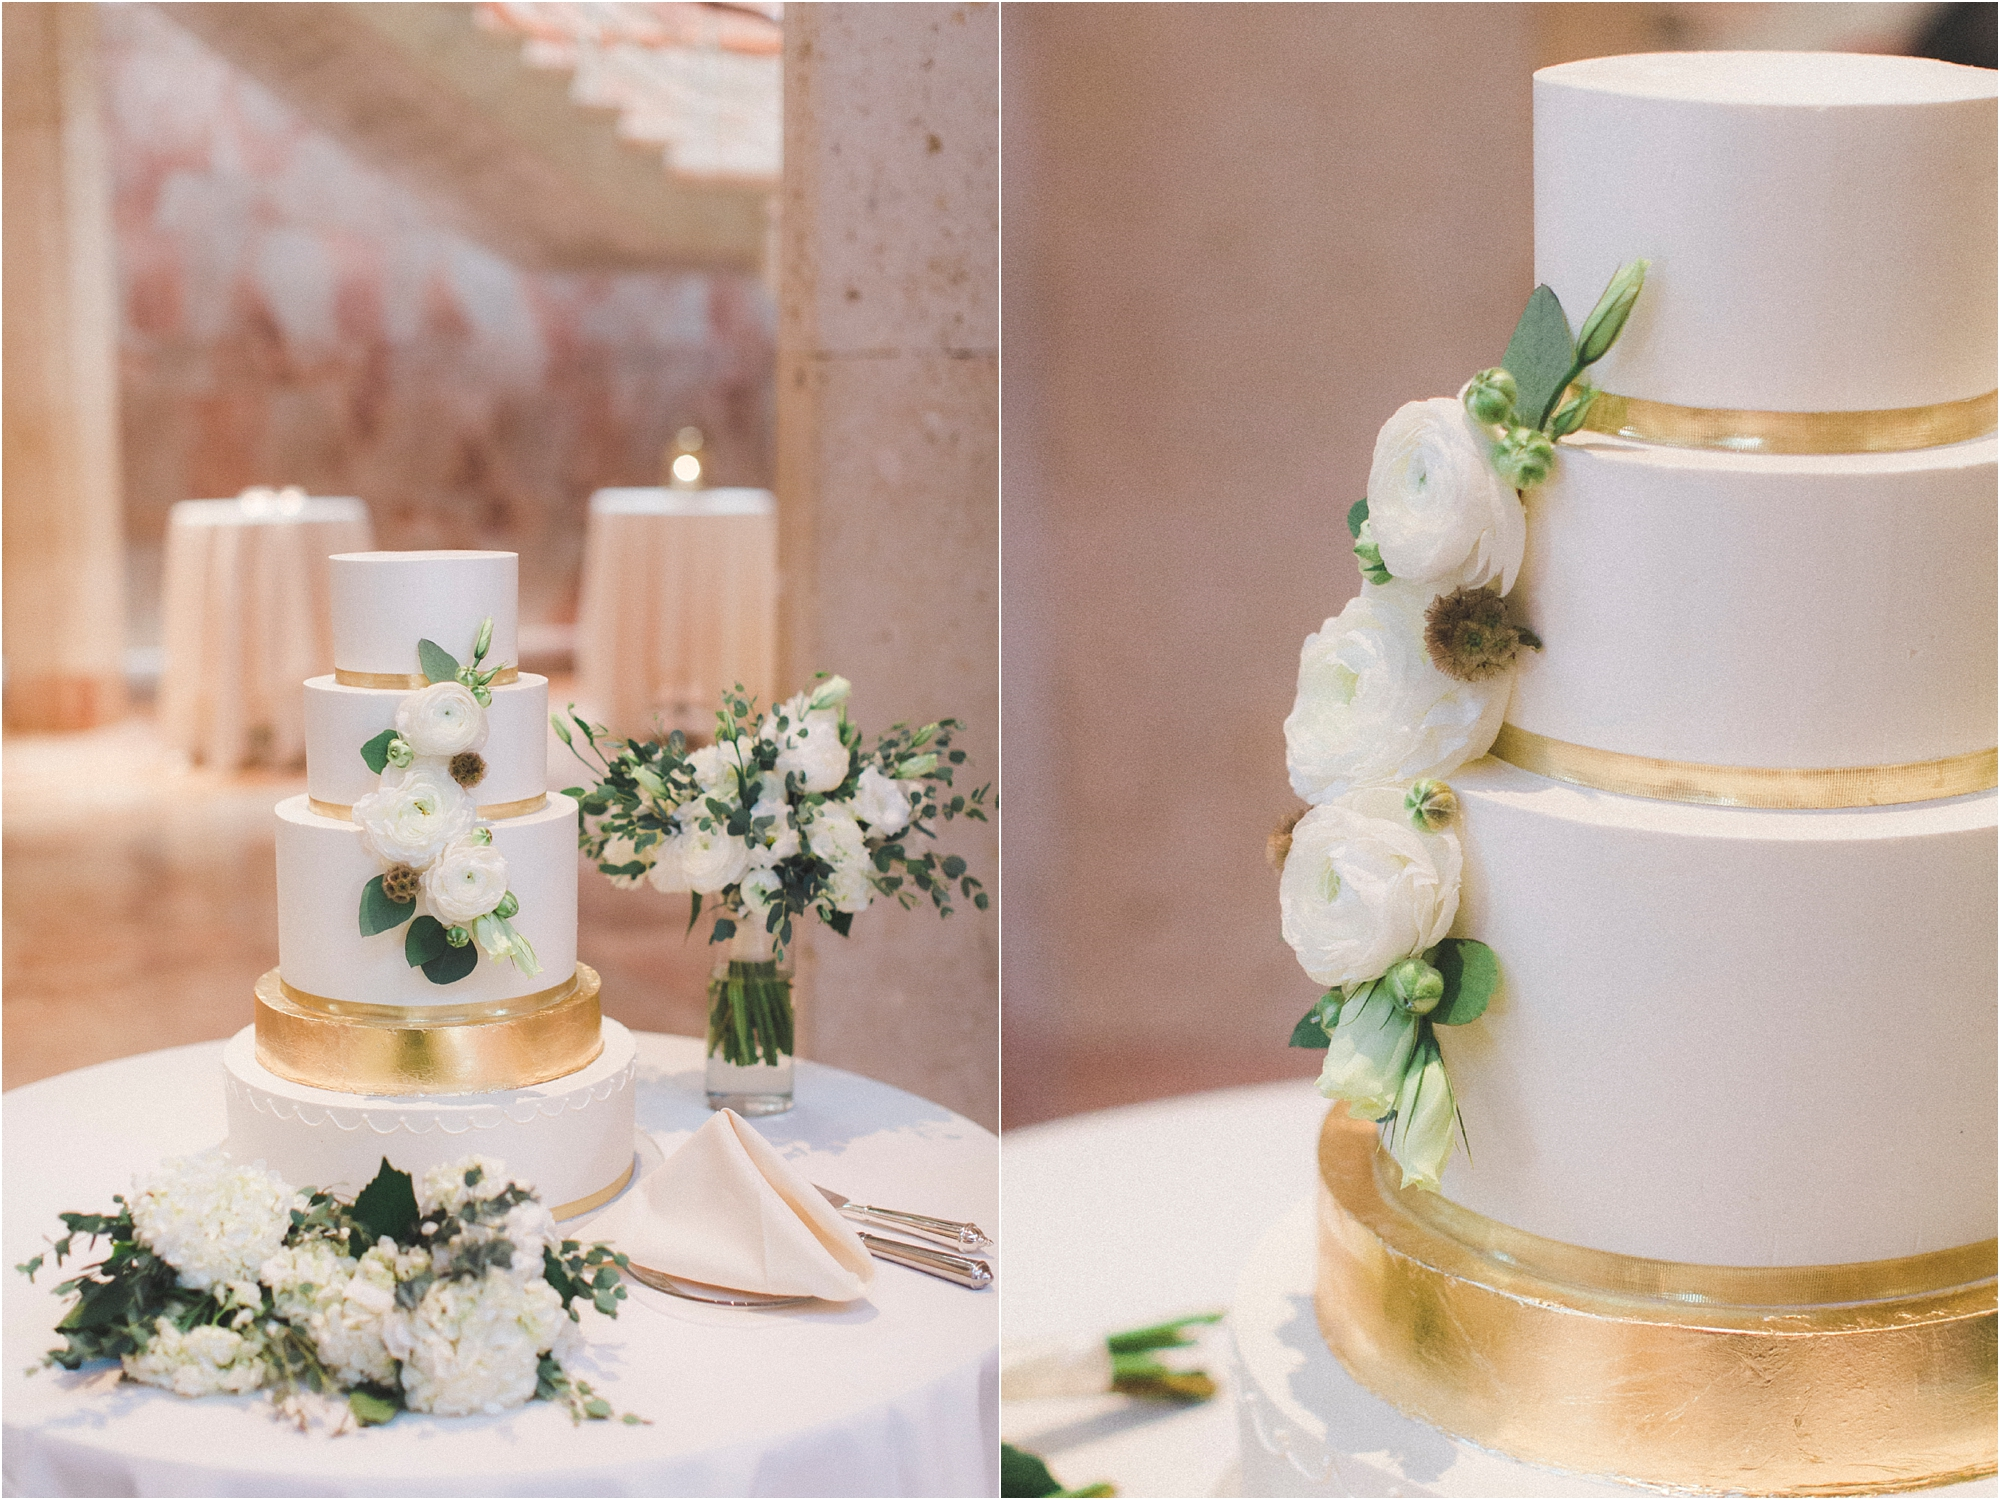 stephanie-yonce-photography-historic-church-virginia-museu-fine-arts-wedding-photos_063.JPG